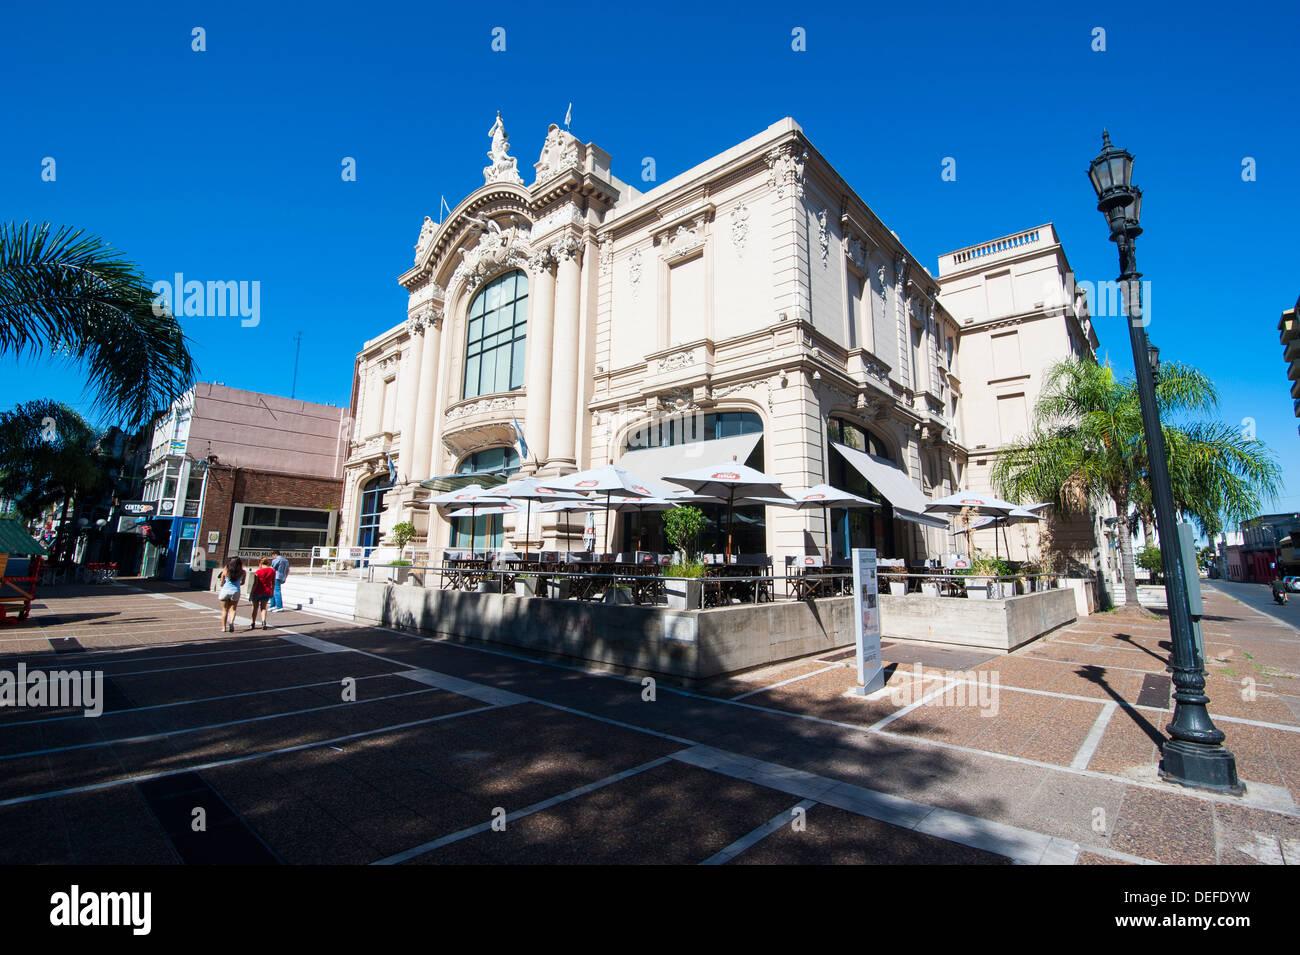 Municipal theater of Santa Fe, capital of the province of Santa Fe, Argentina, South America - Stock Image